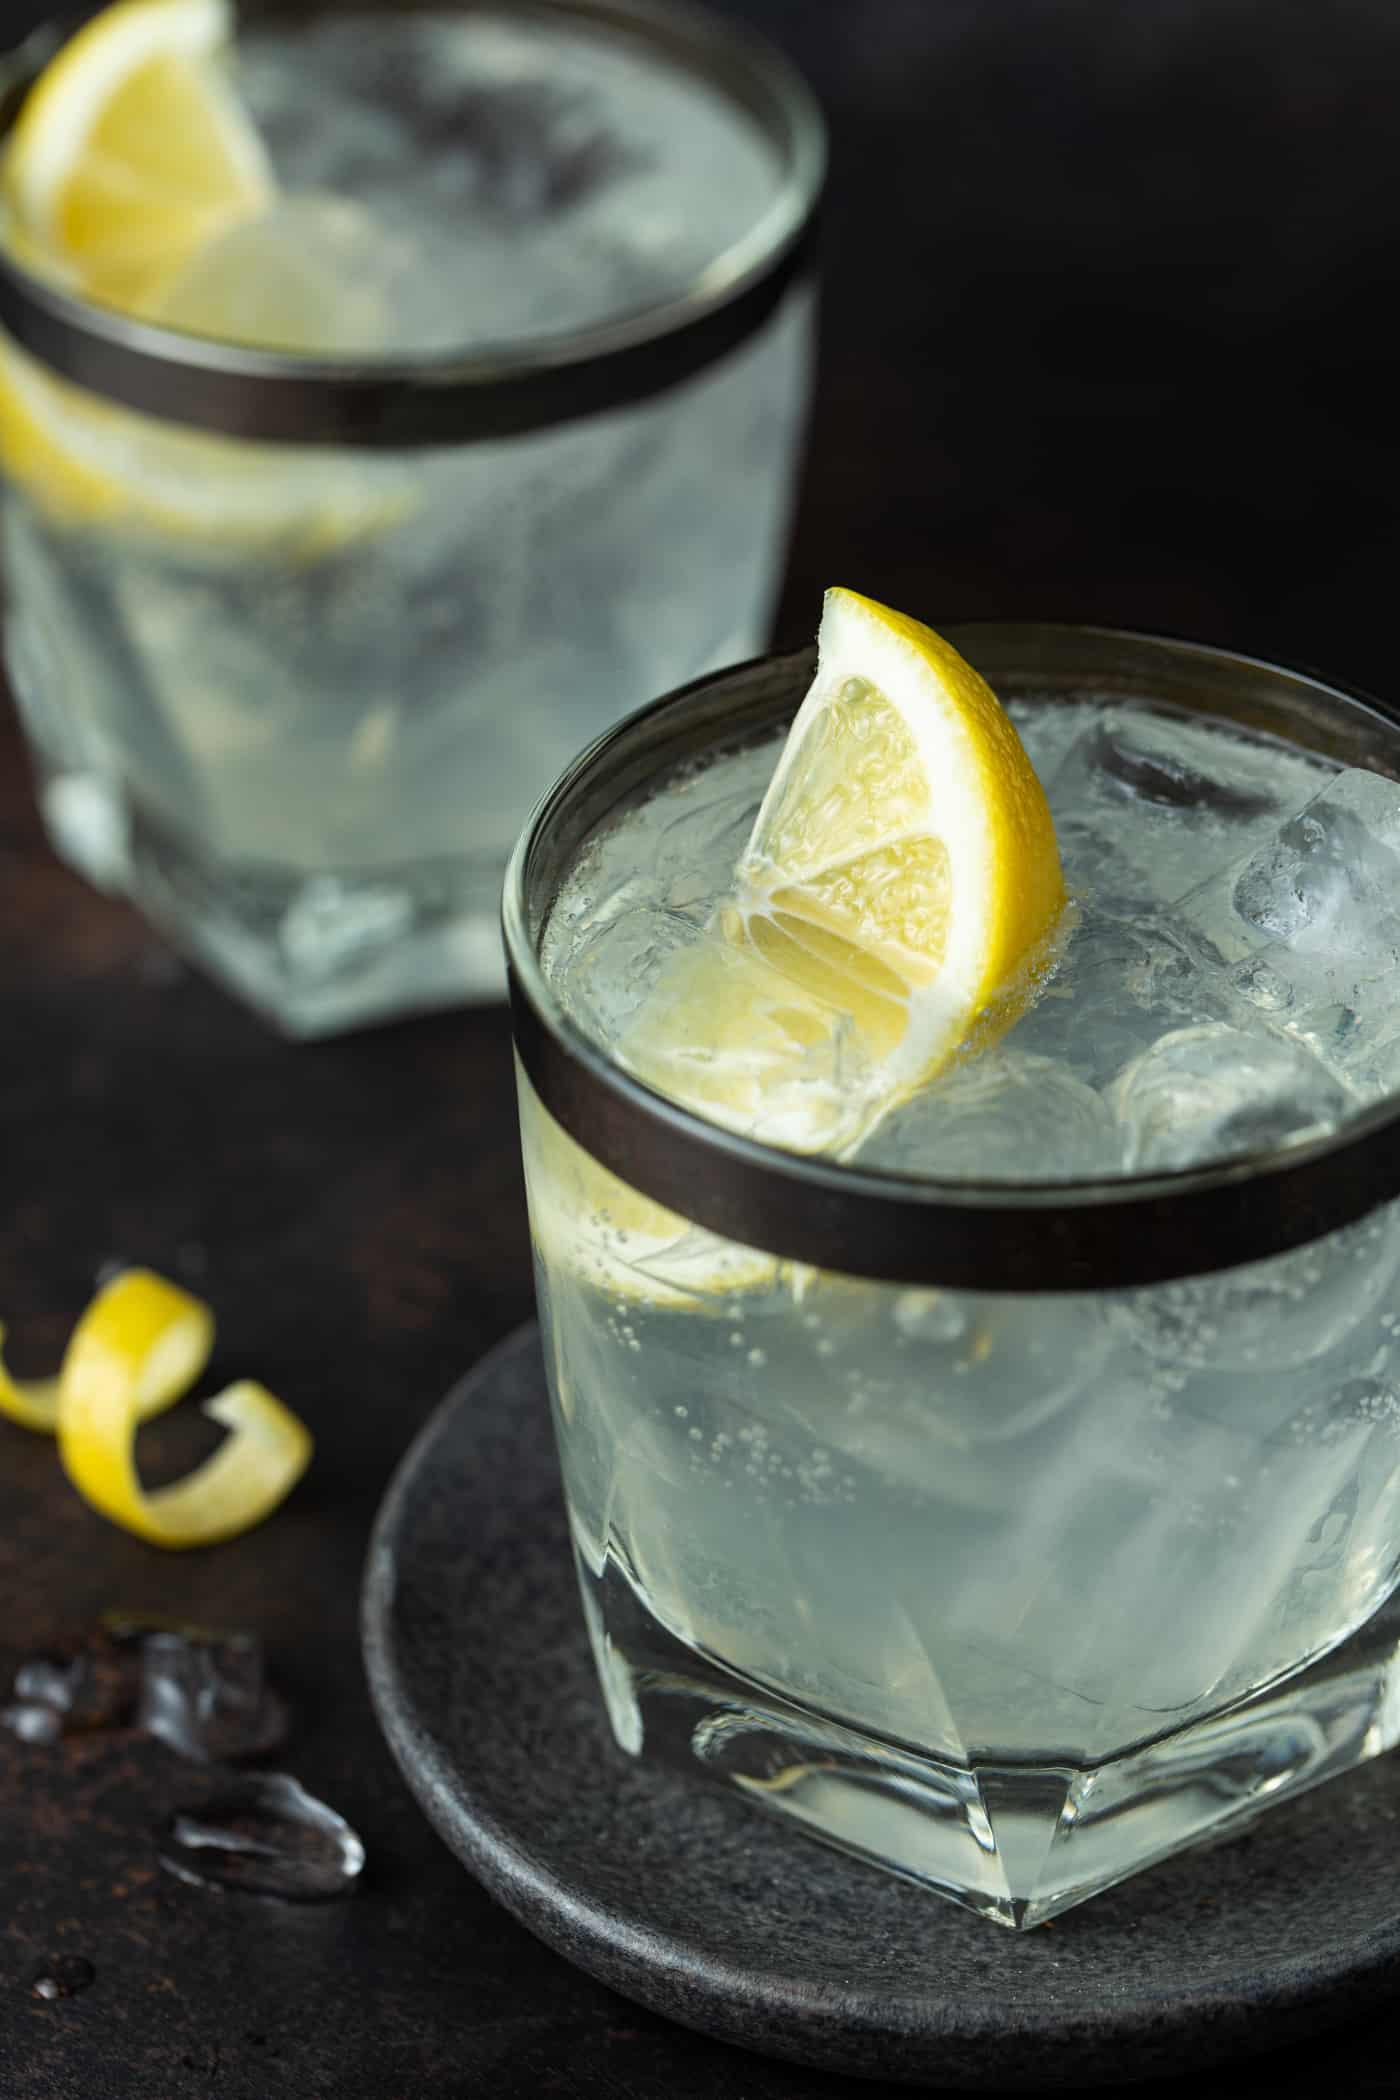 Two lowball glasses filled with Elderflower Vodka Soda. Garnished with fresh lemon wedges.